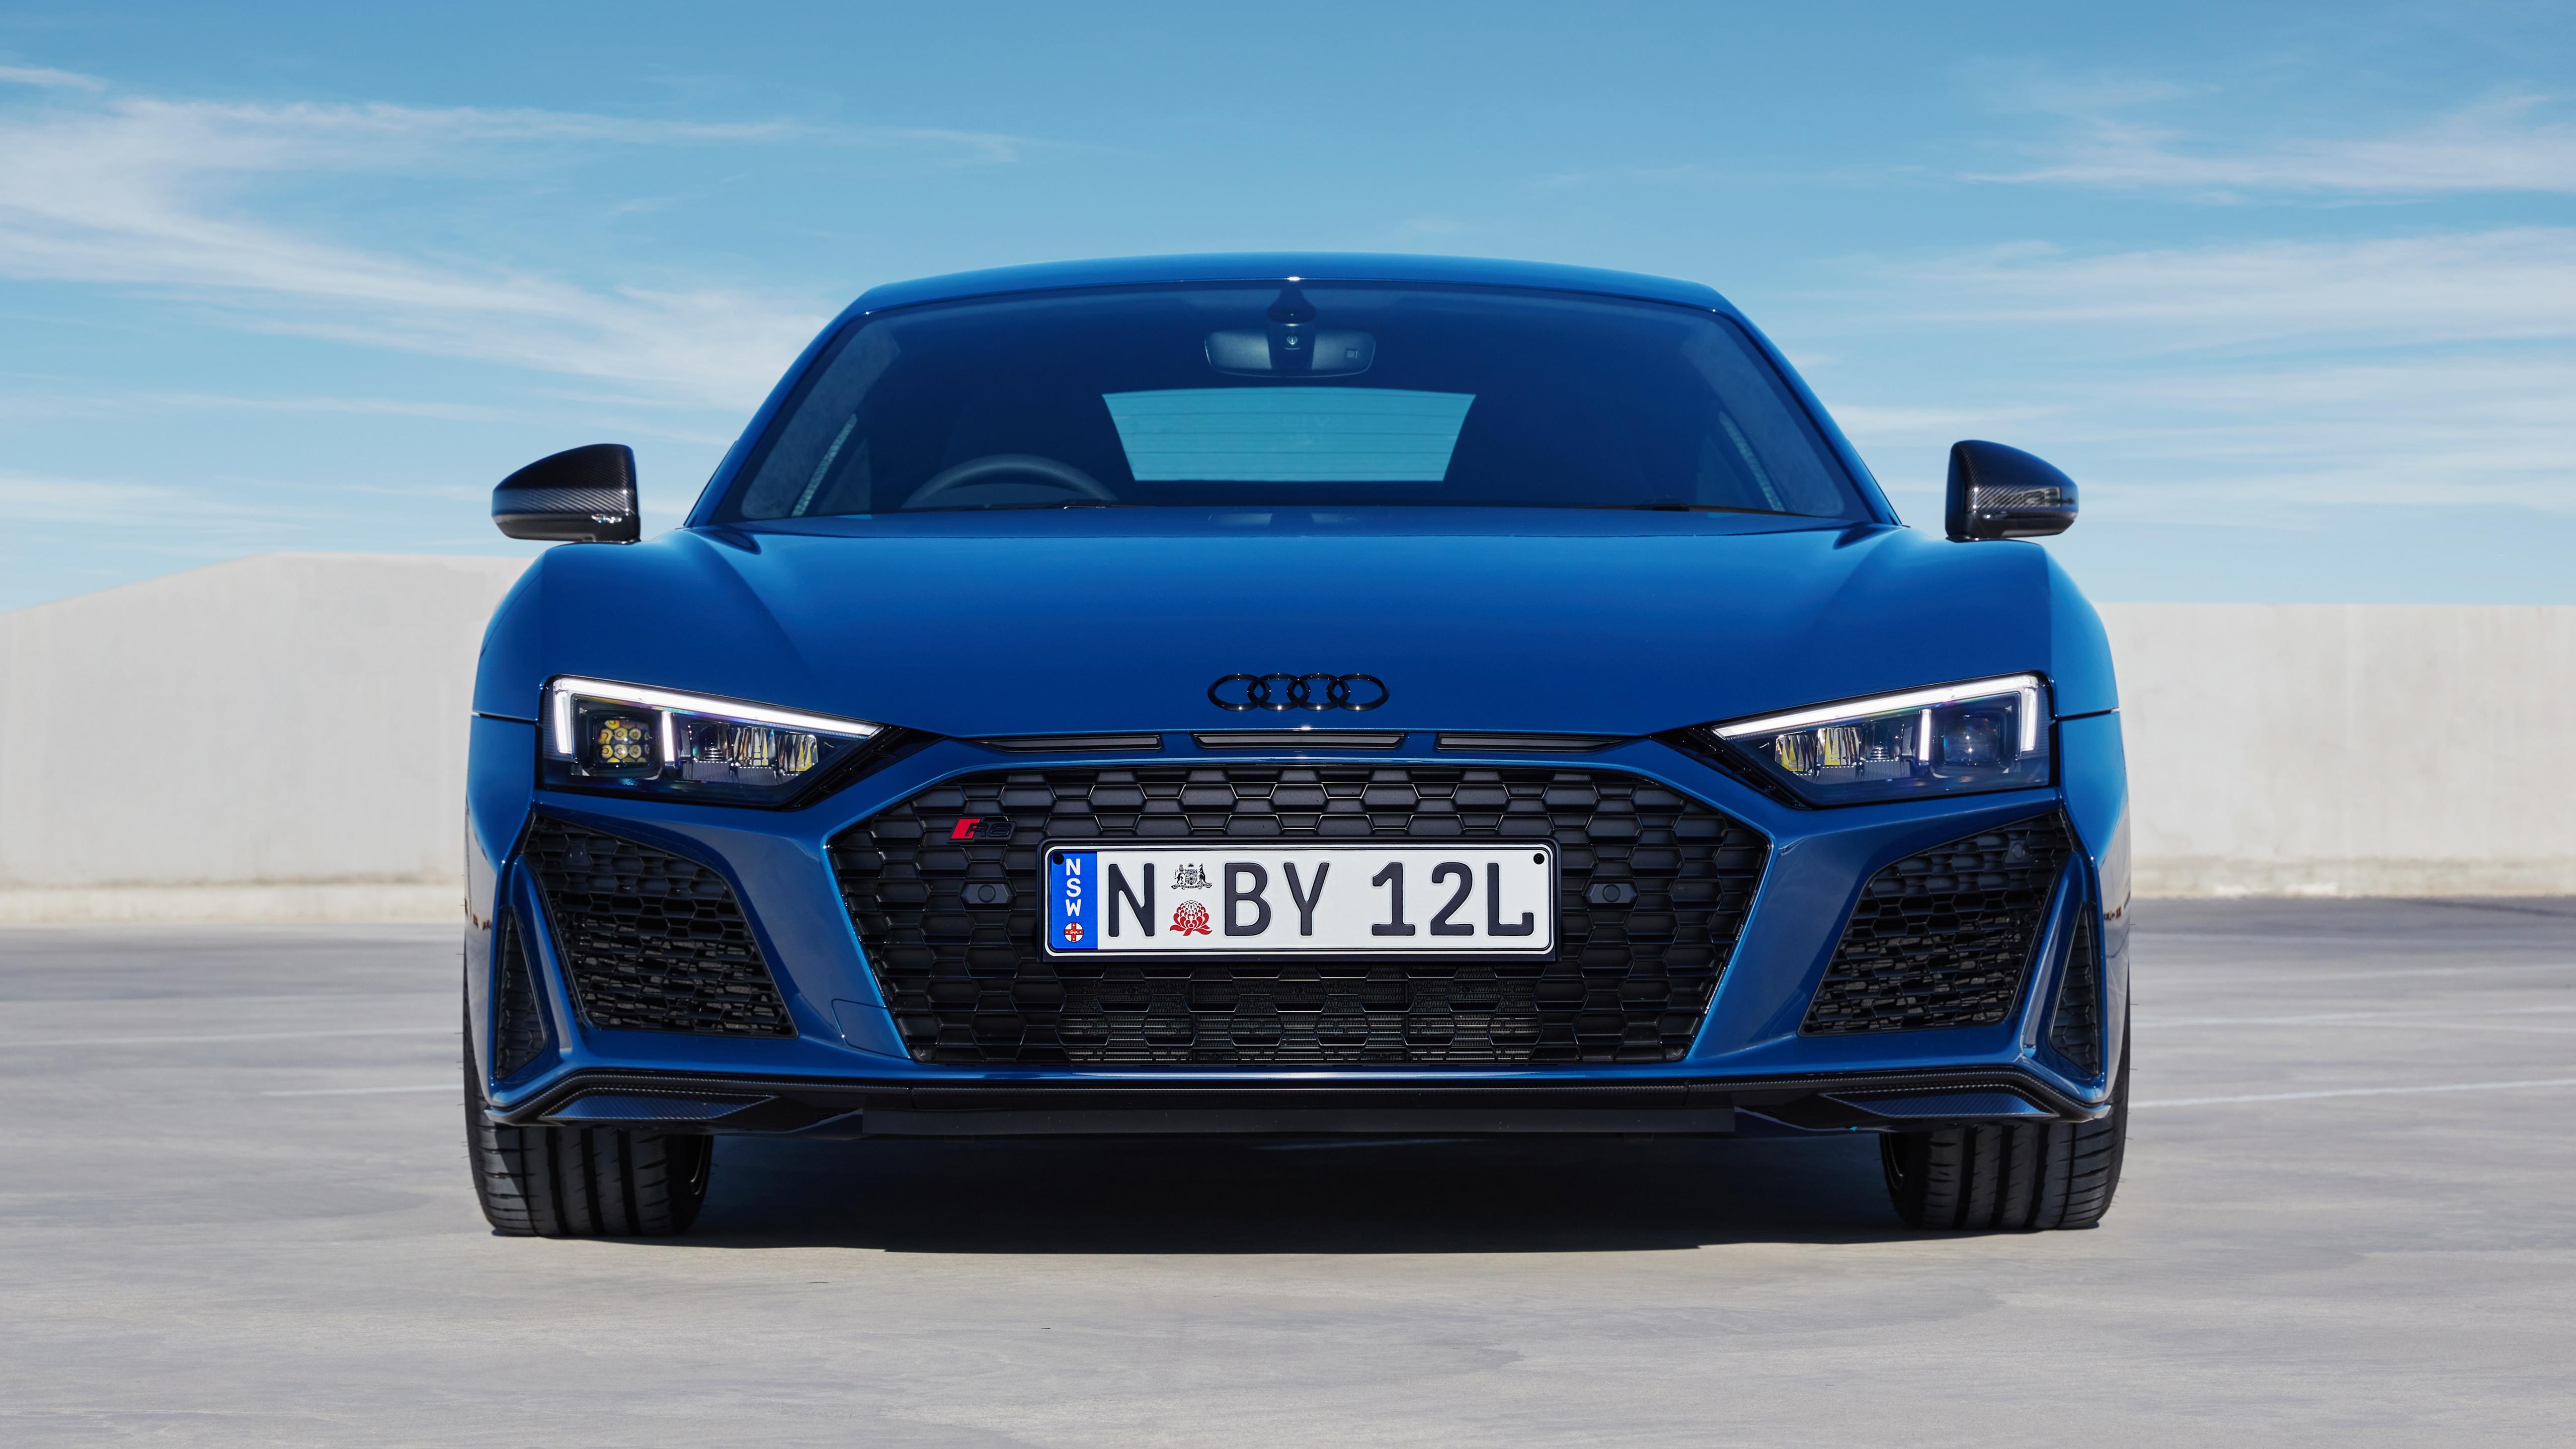 Audi R8 V10 Performance 2020 5k Wallpaper Hd Car Wallpapers Id 15290